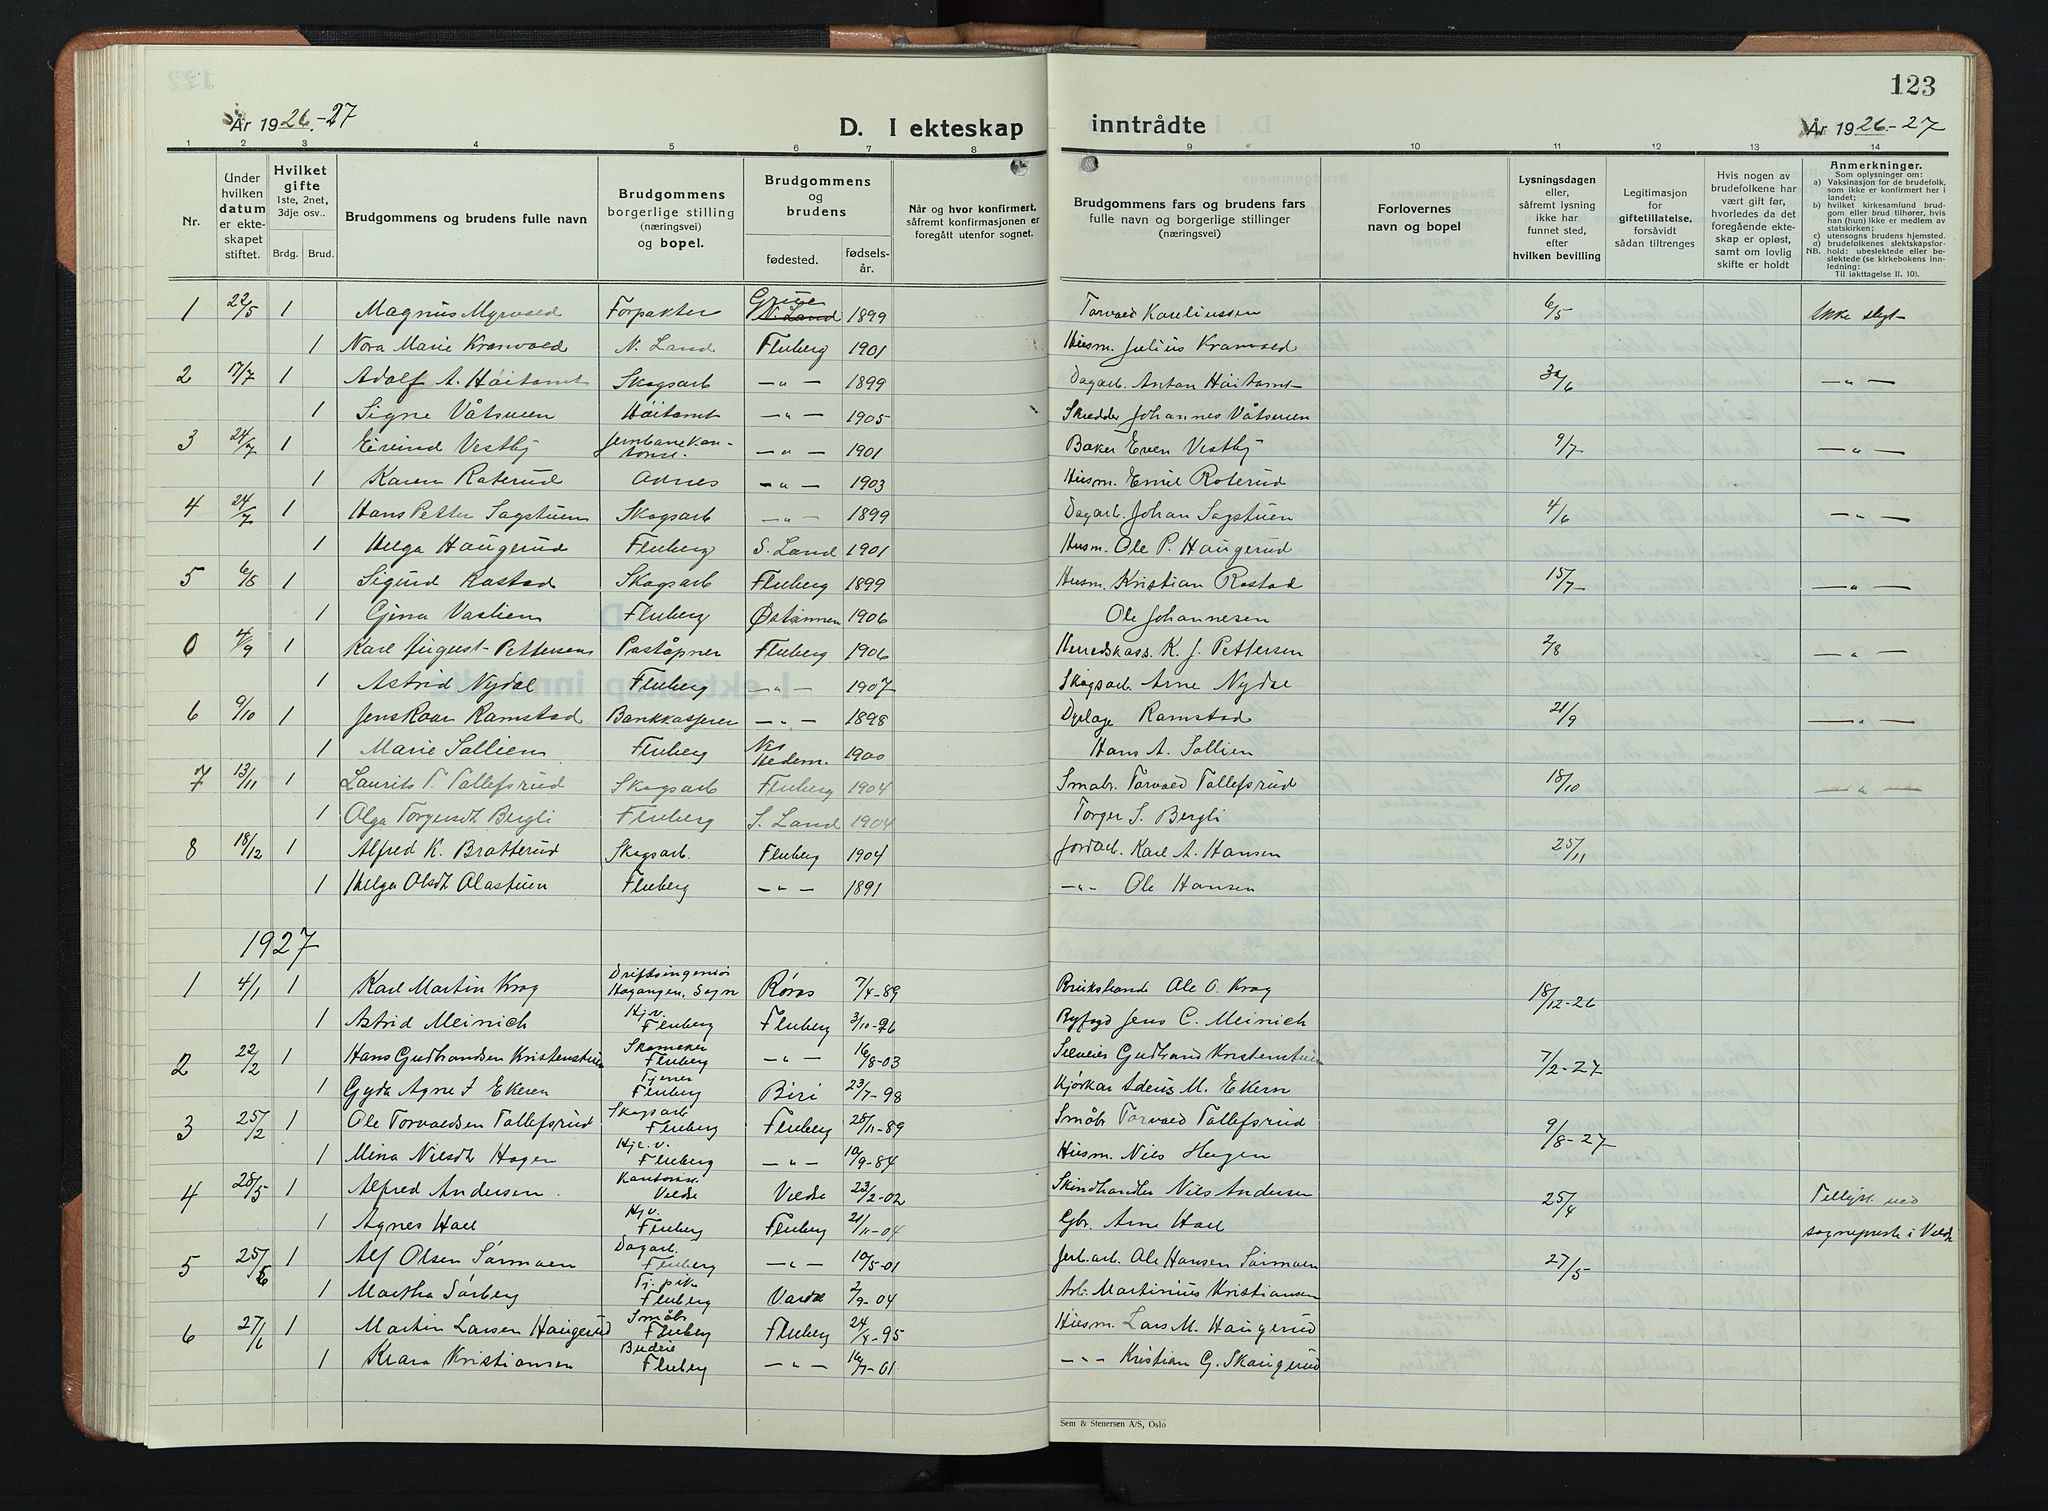 SAH, Søndre Land prestekontor, L/L0008: Klokkerbok nr. 8, 1926-1950, s. 123